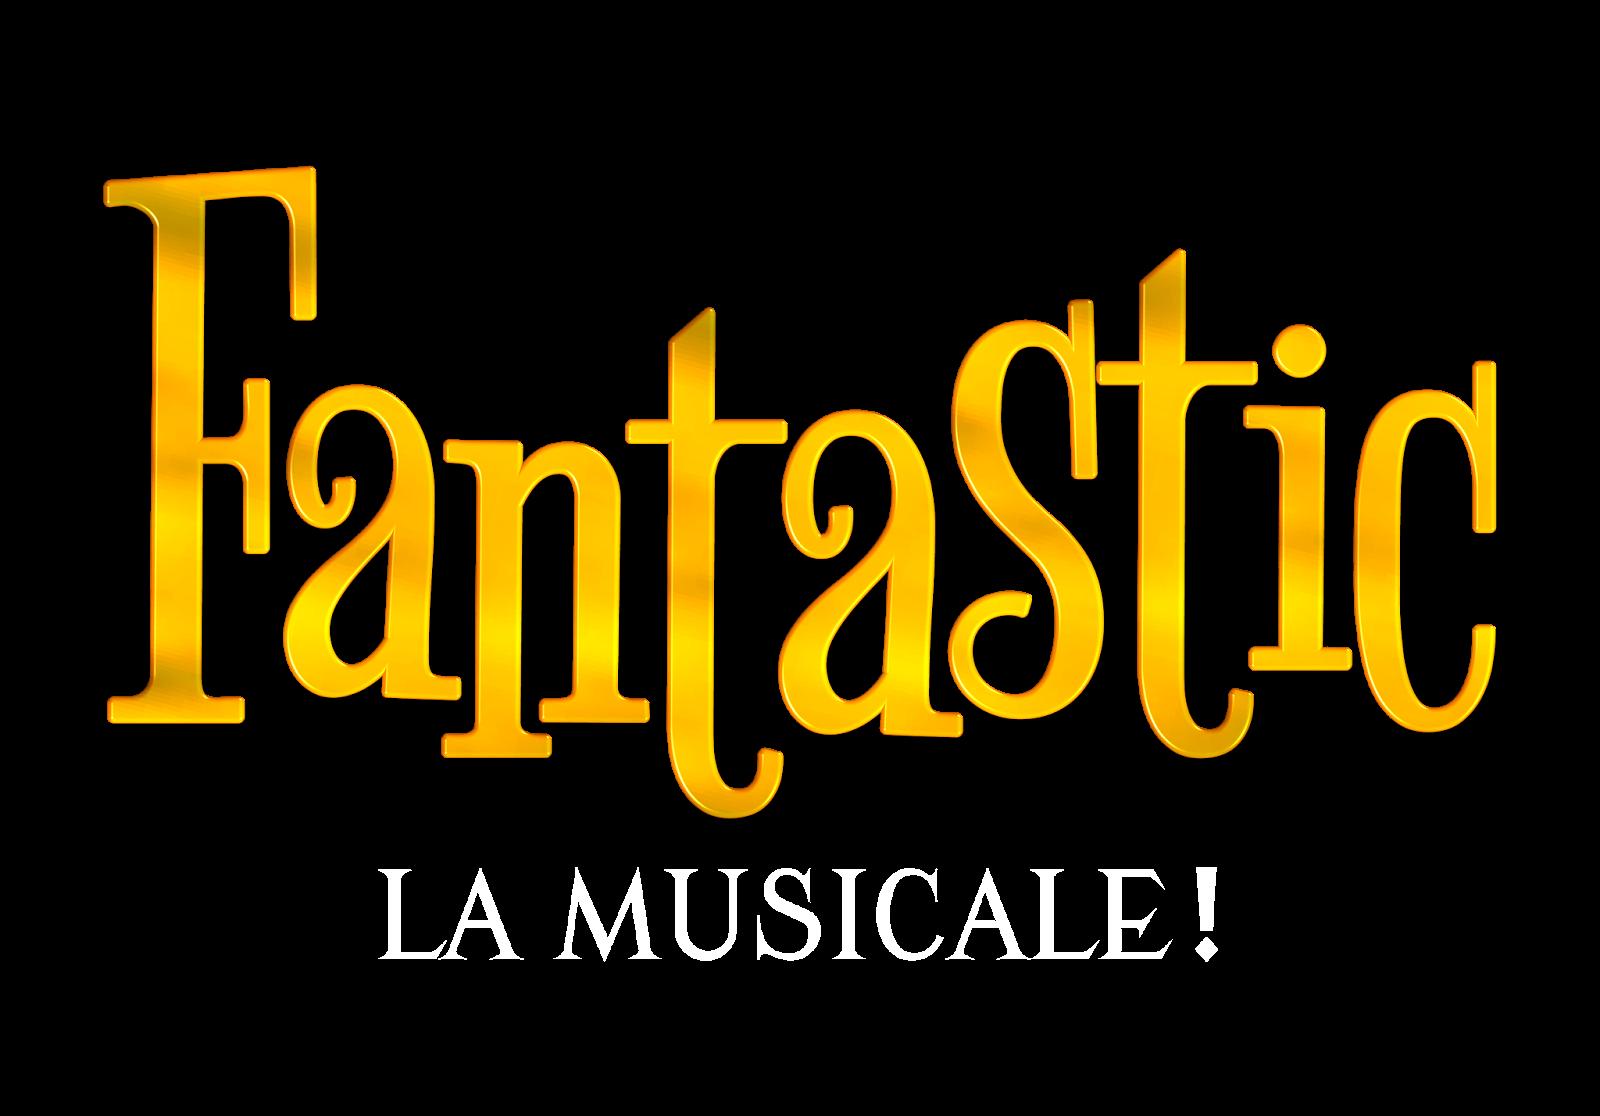 Fantastic - LA MUSICALE !